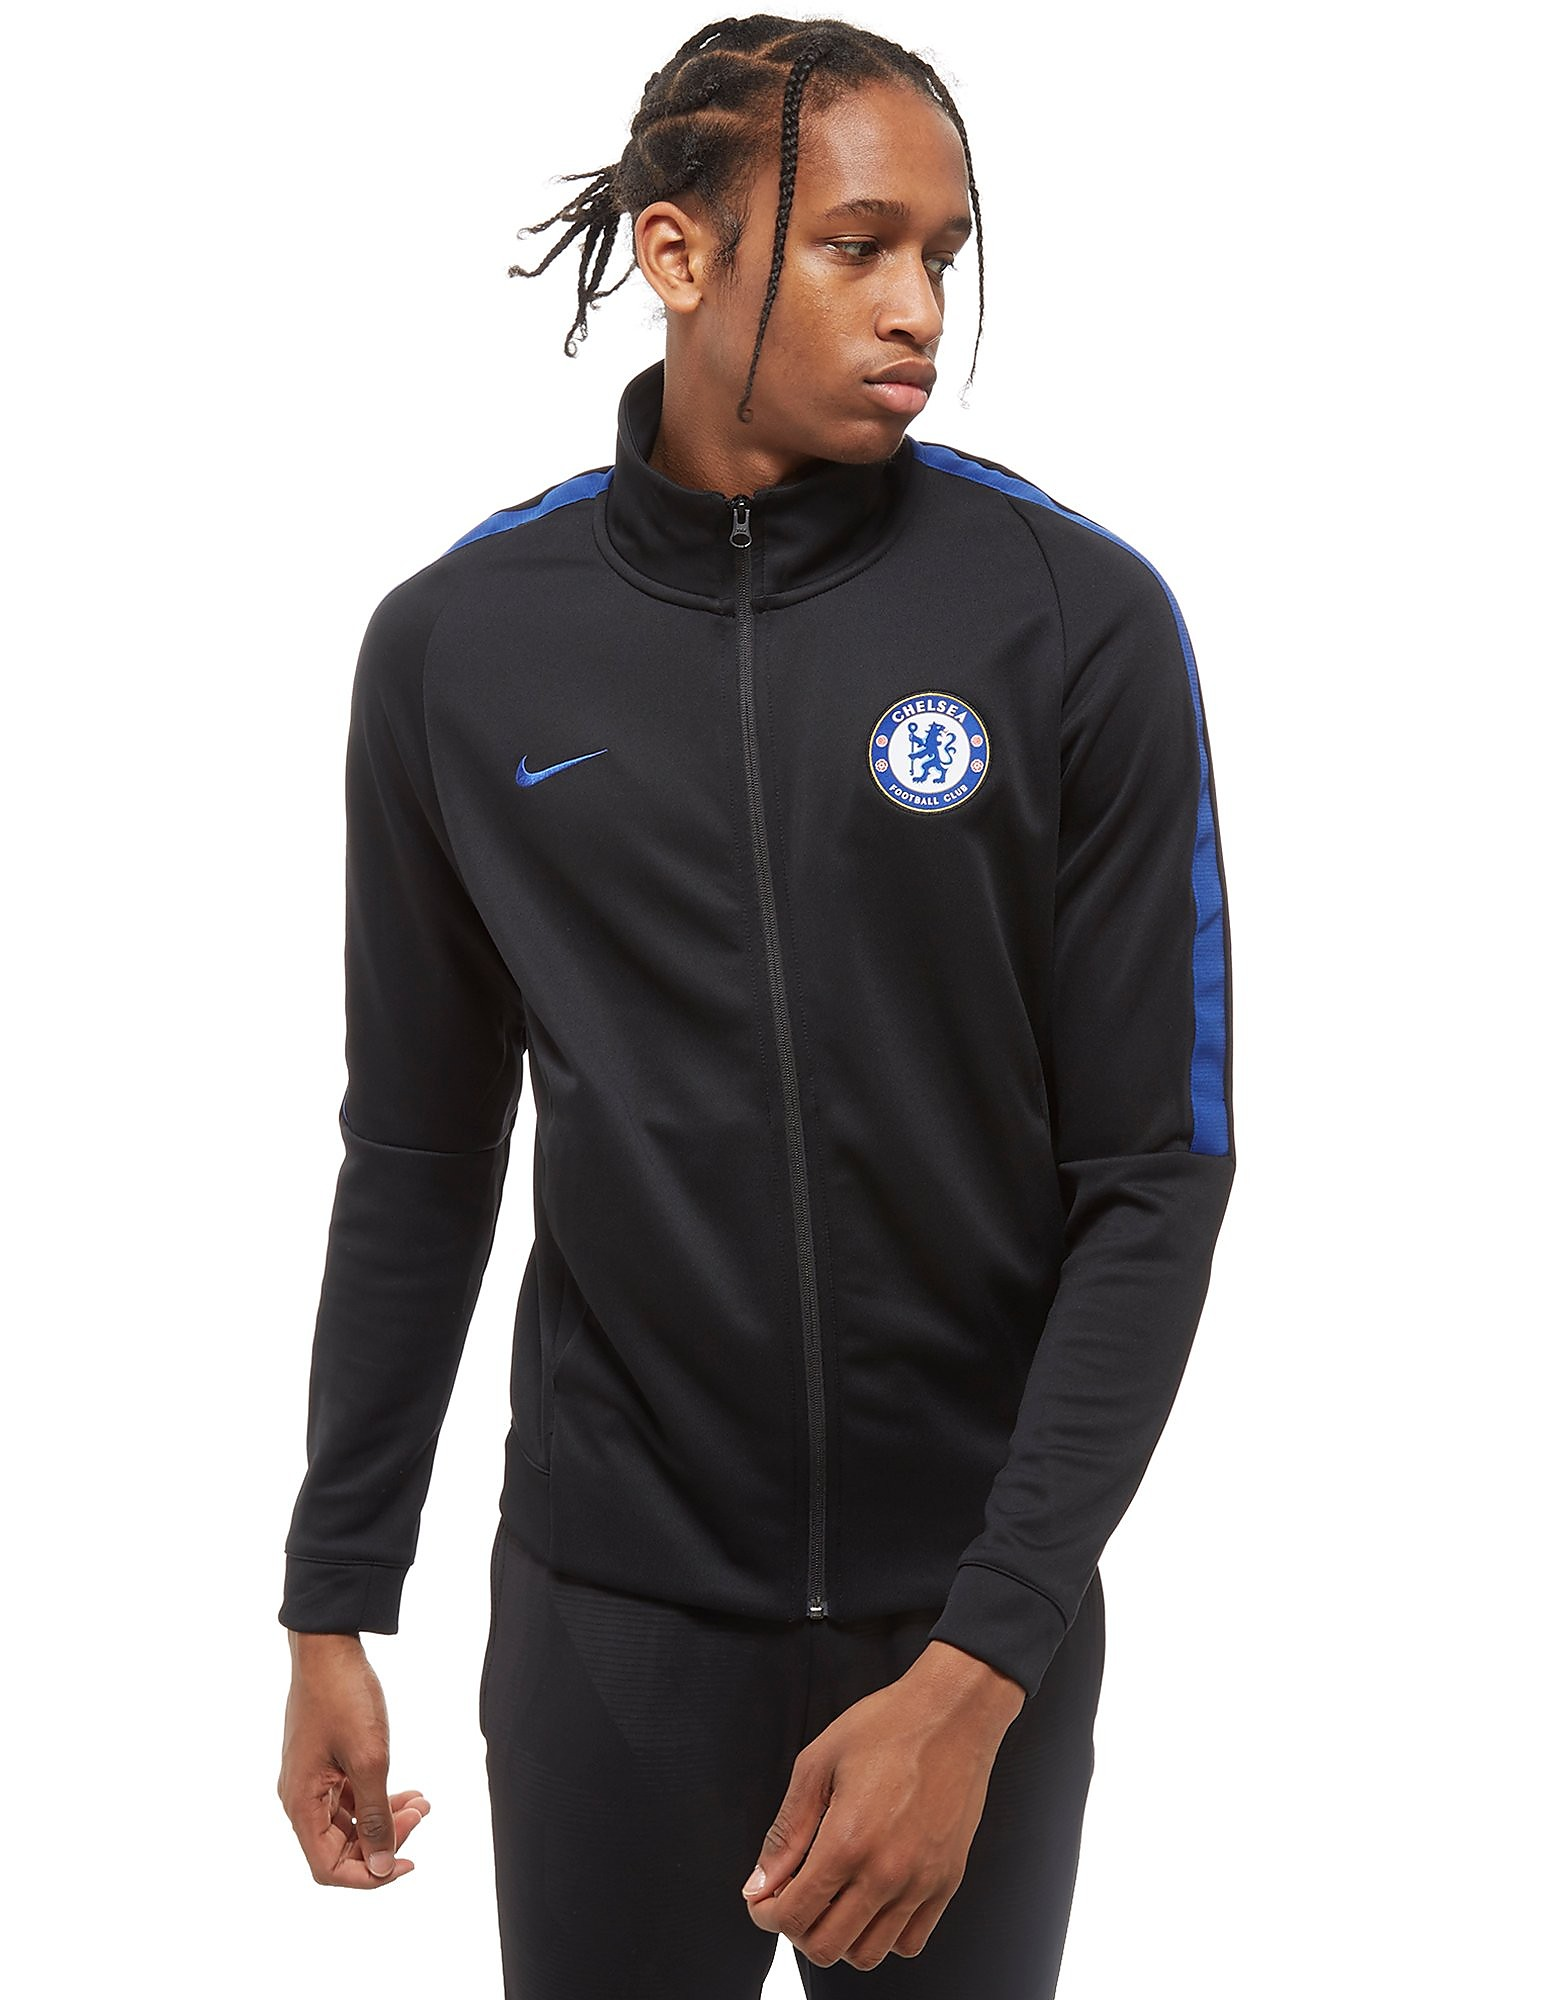 Nike Veste zippée Chelsea FC N98 Homme